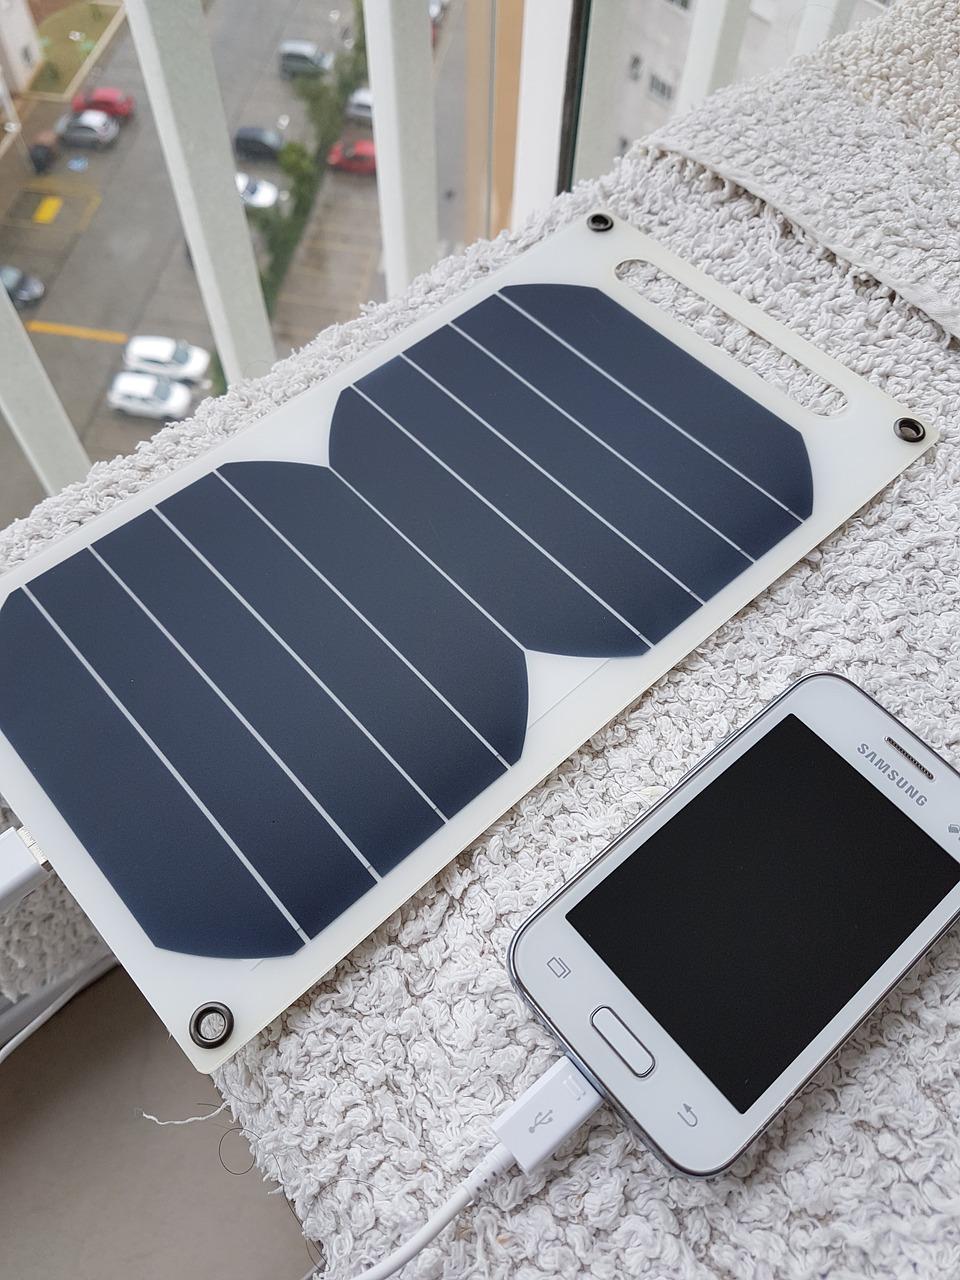 Screen Printing Ultrathin Batteries On Solar Panels